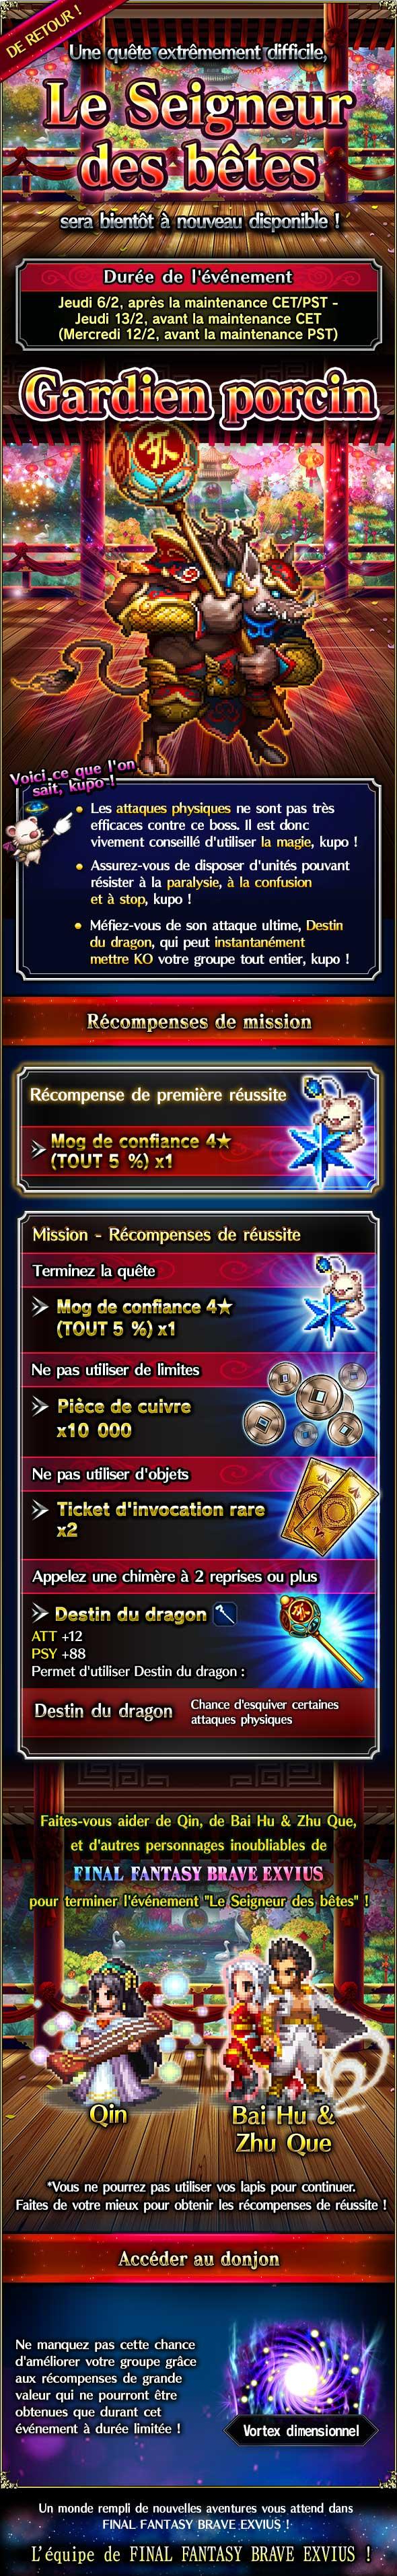 Trial Event LNY (rerun) - Le Seigneur des bêtes - du 06/02 au 13/02/20 20200204LordoftheBeastsRerun